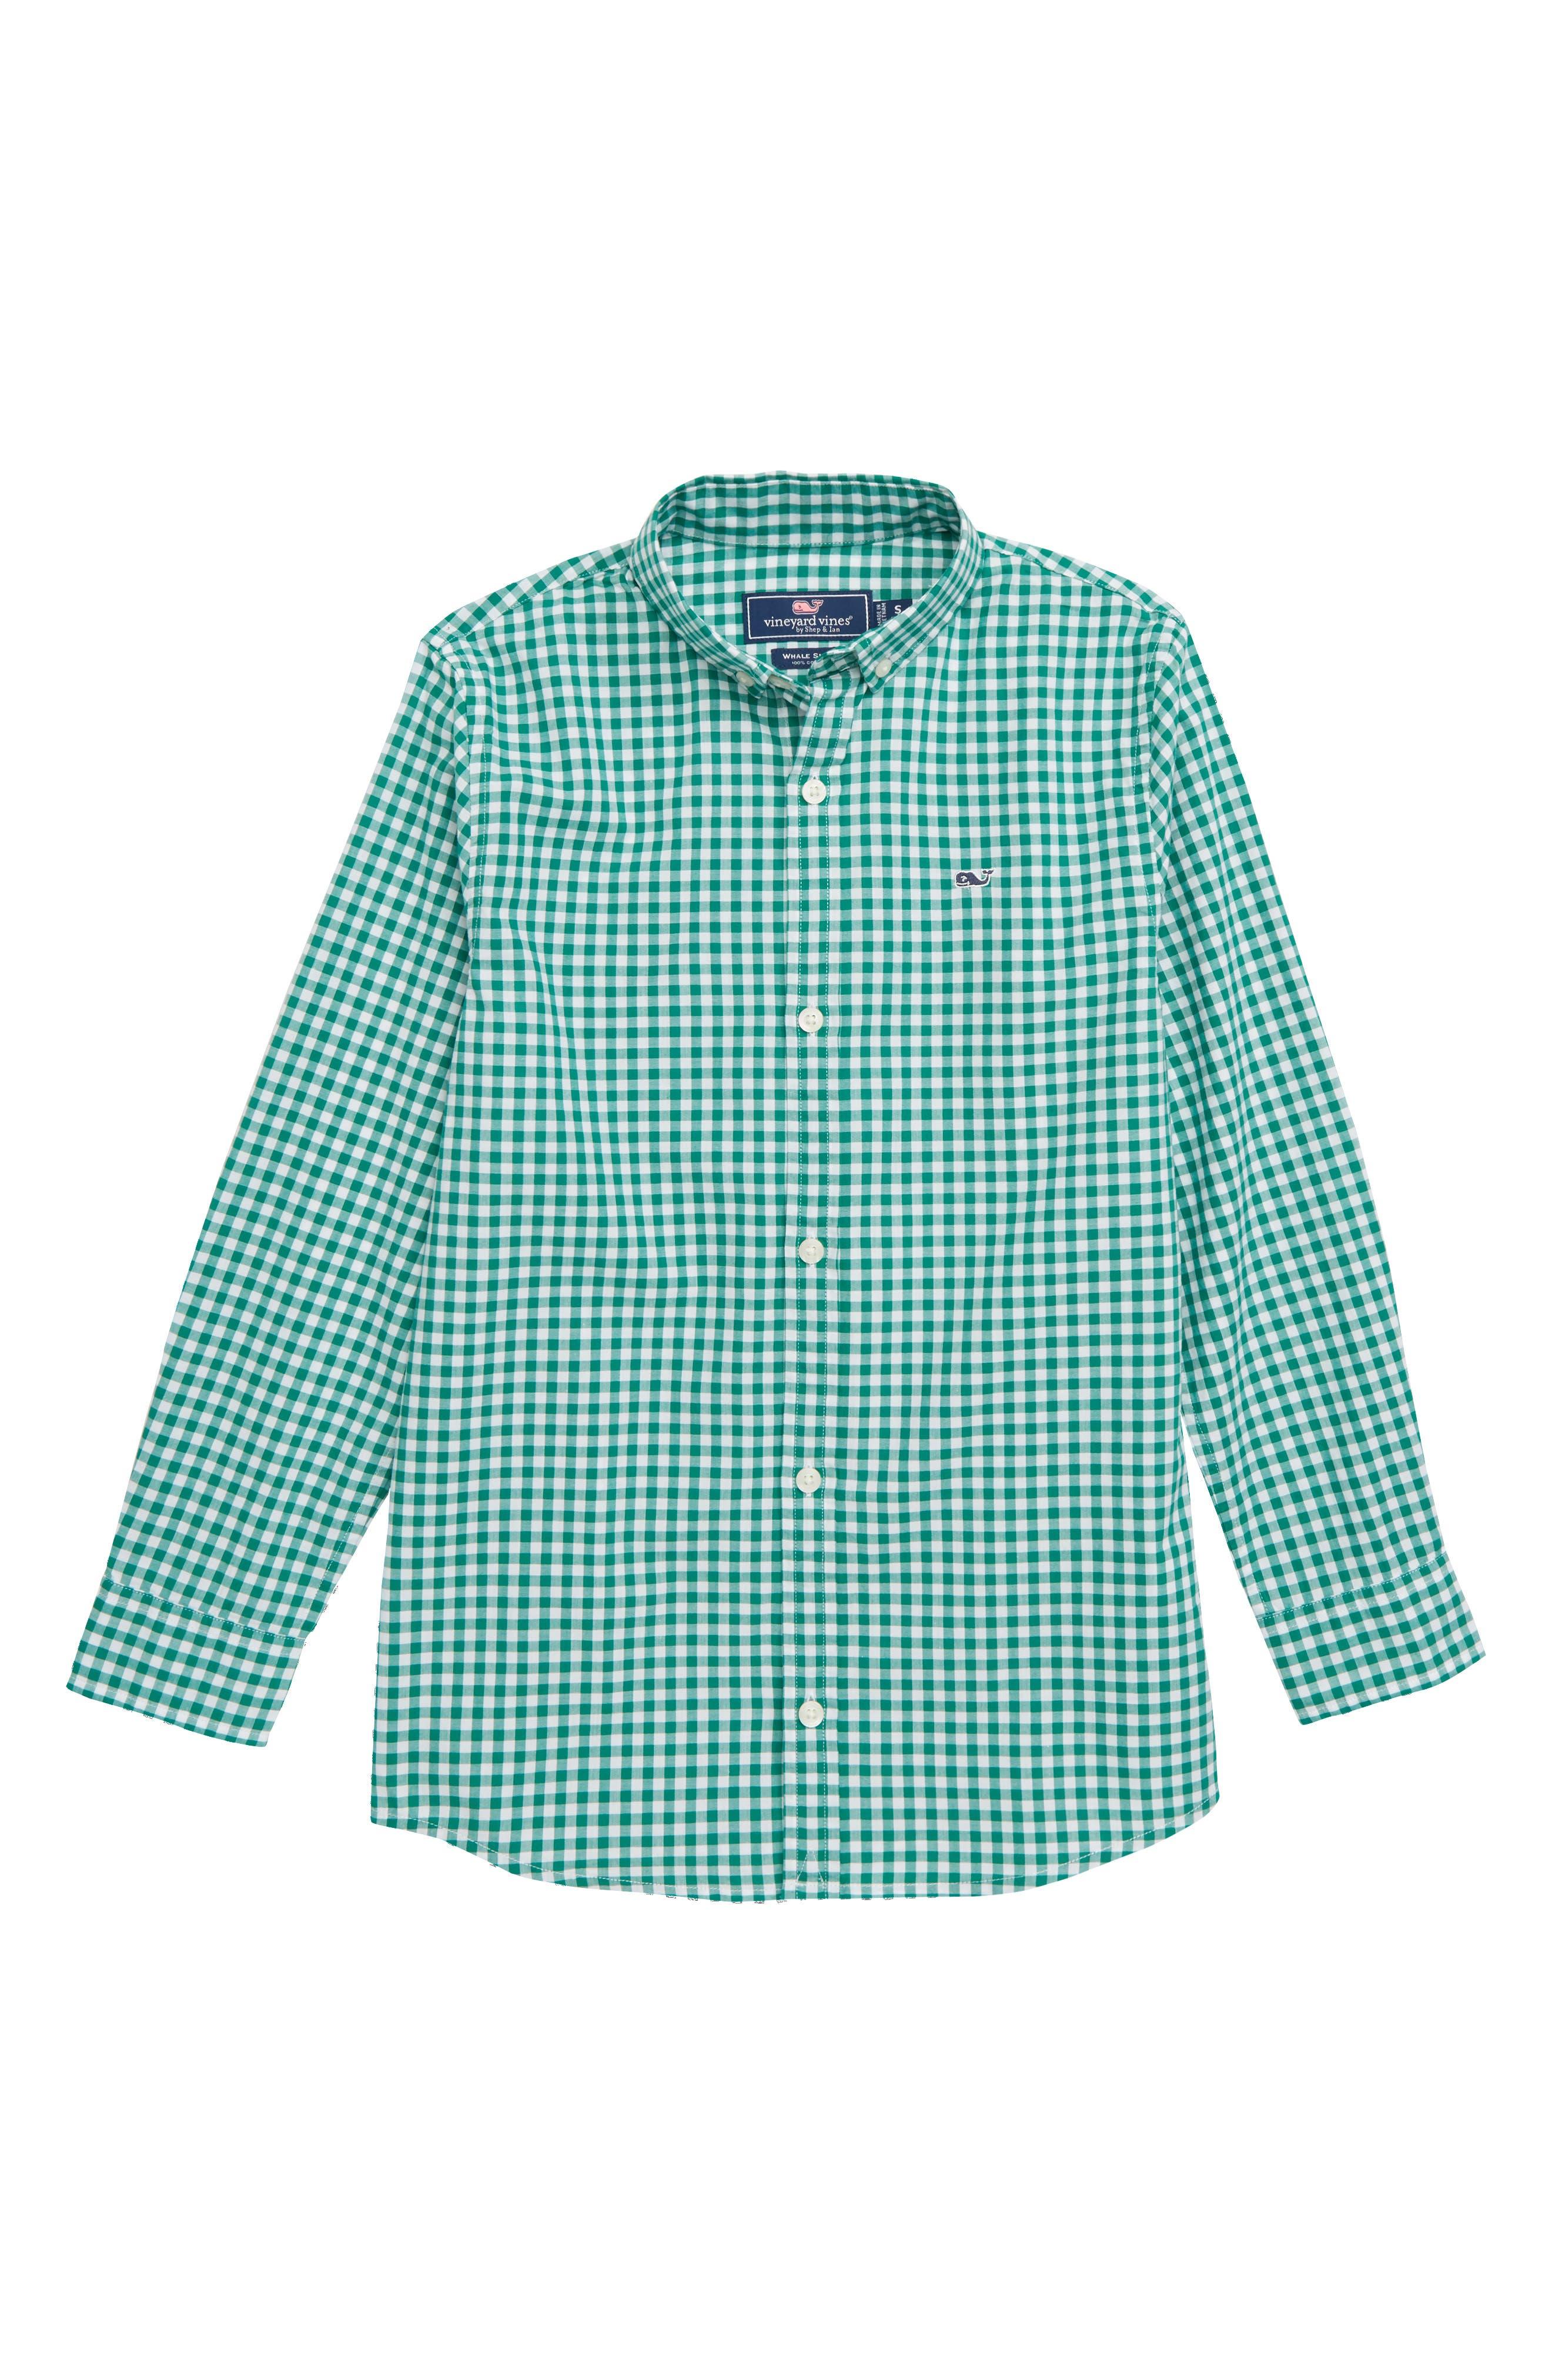 Rockridge Poplin Whale Shirt,                         Main,                         color, GREEN MEADOW